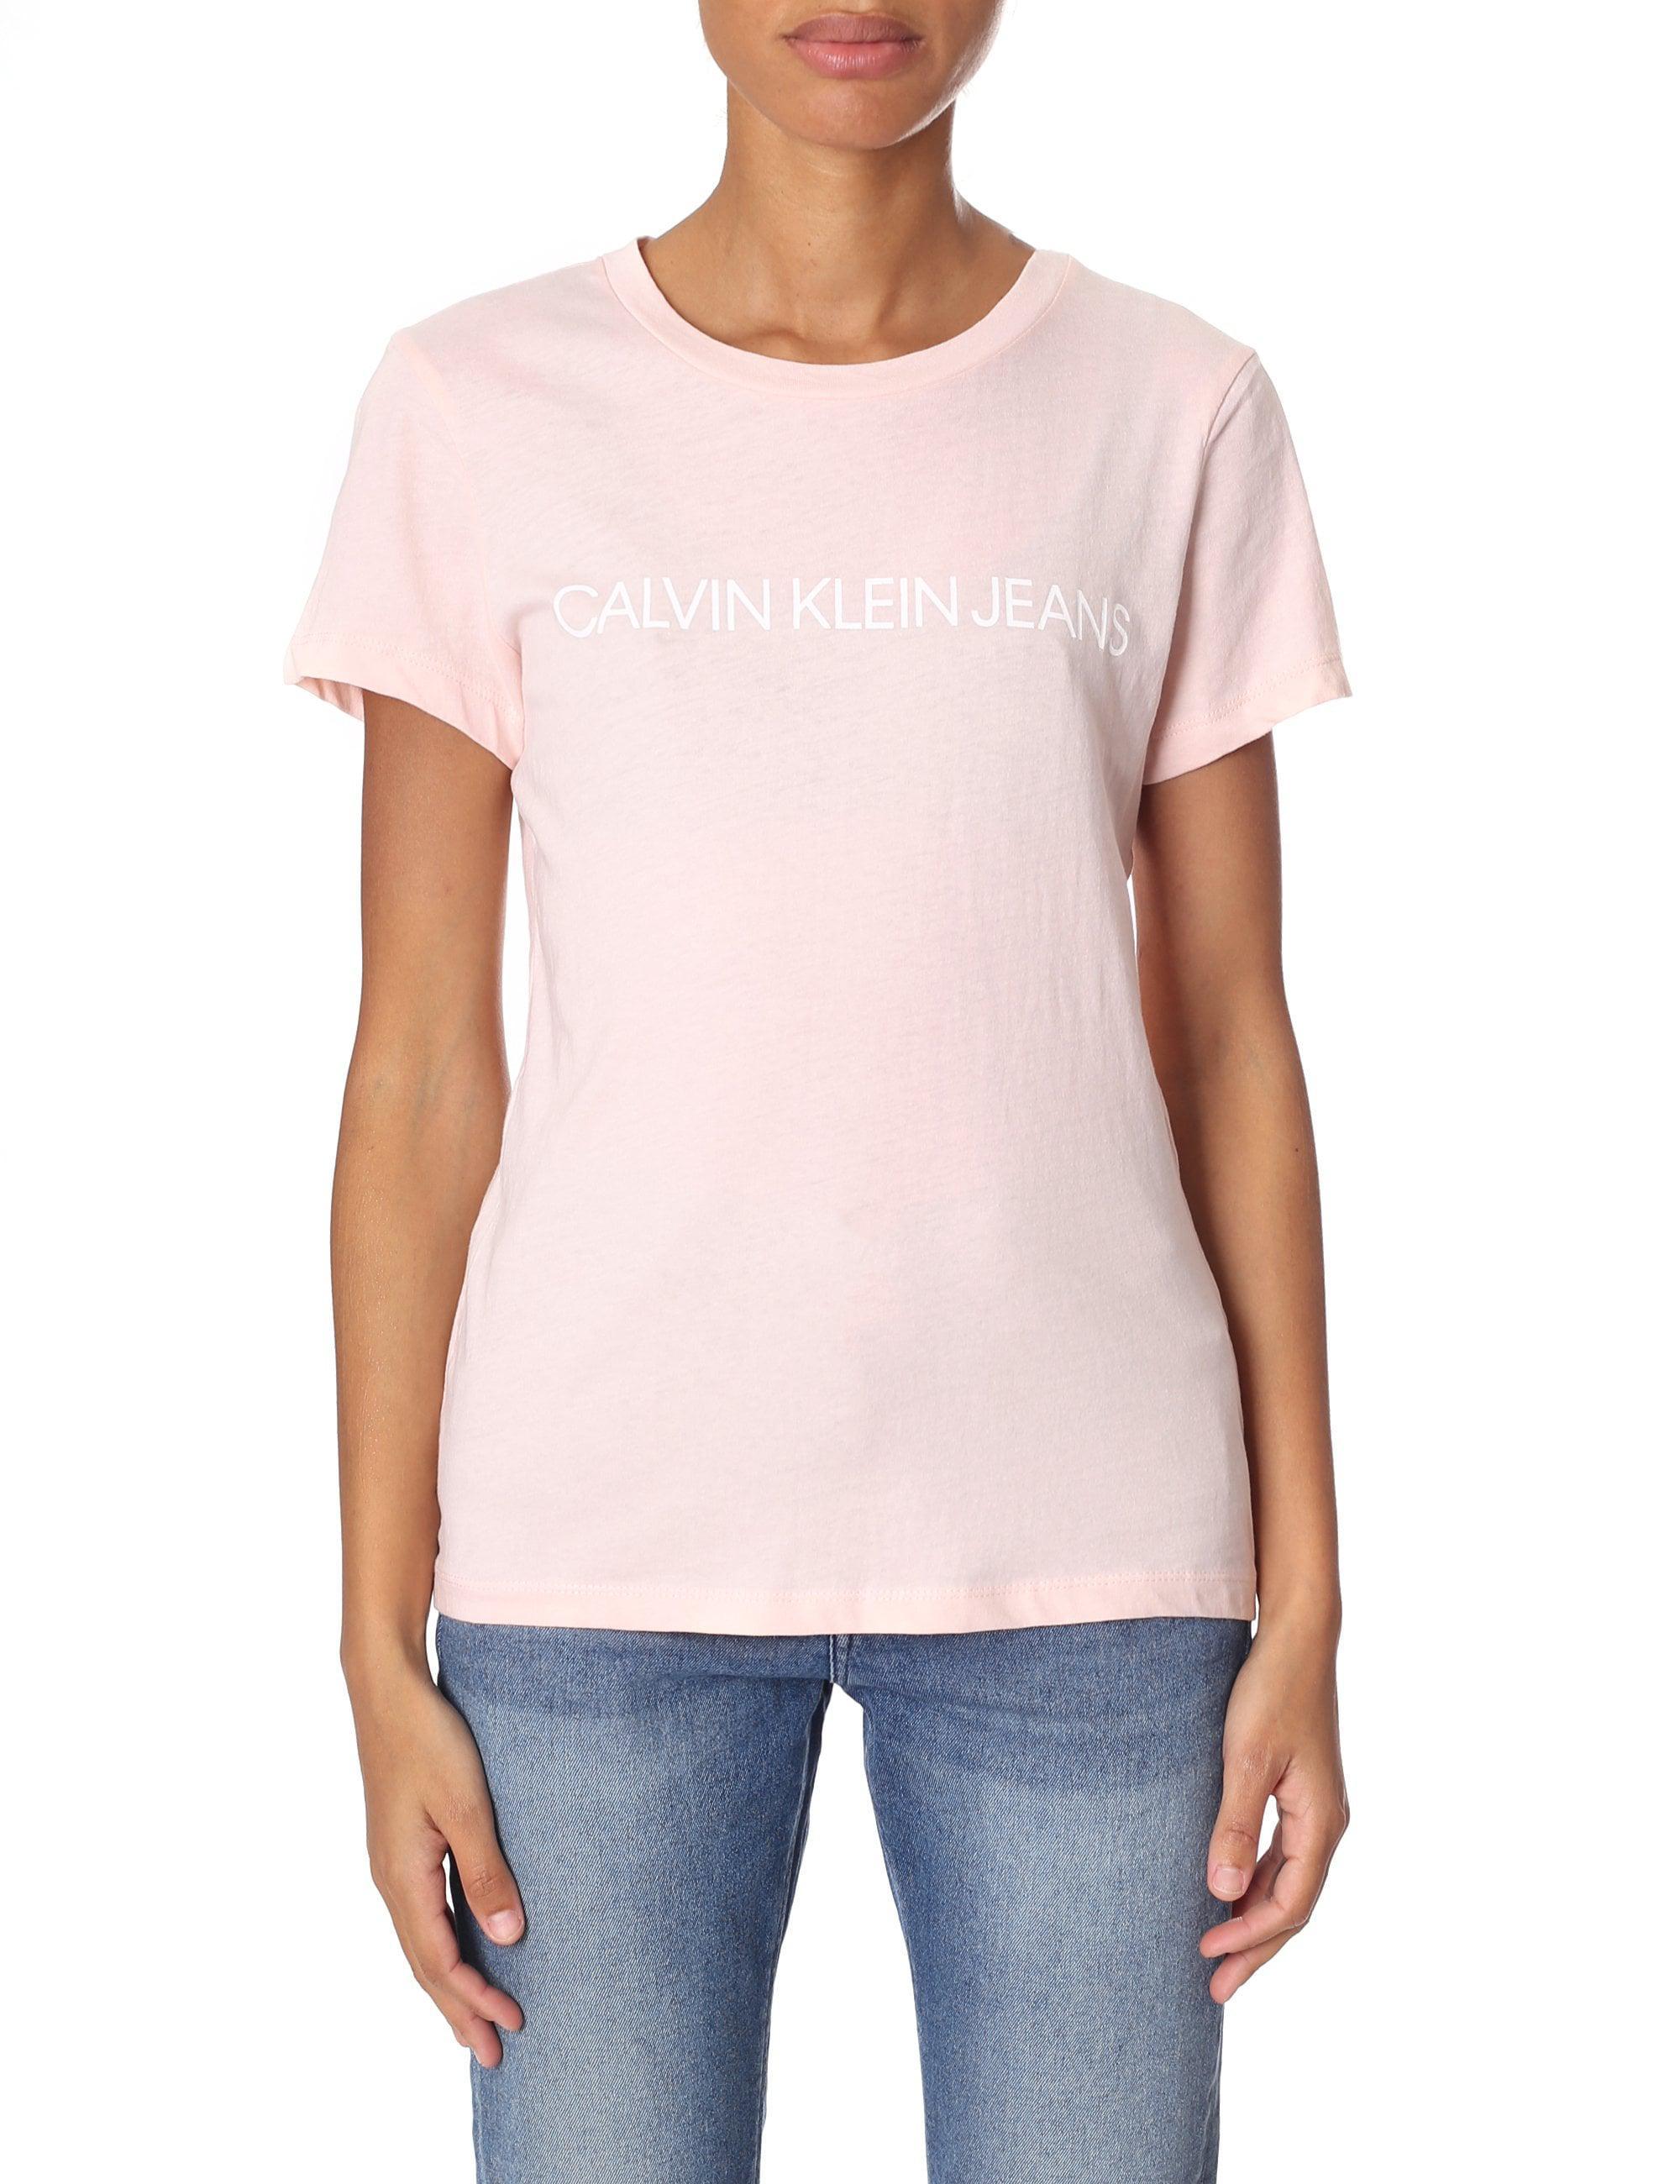 b758e8abb Calvin Klein Institutional Logo Tee in Pink - Lyst